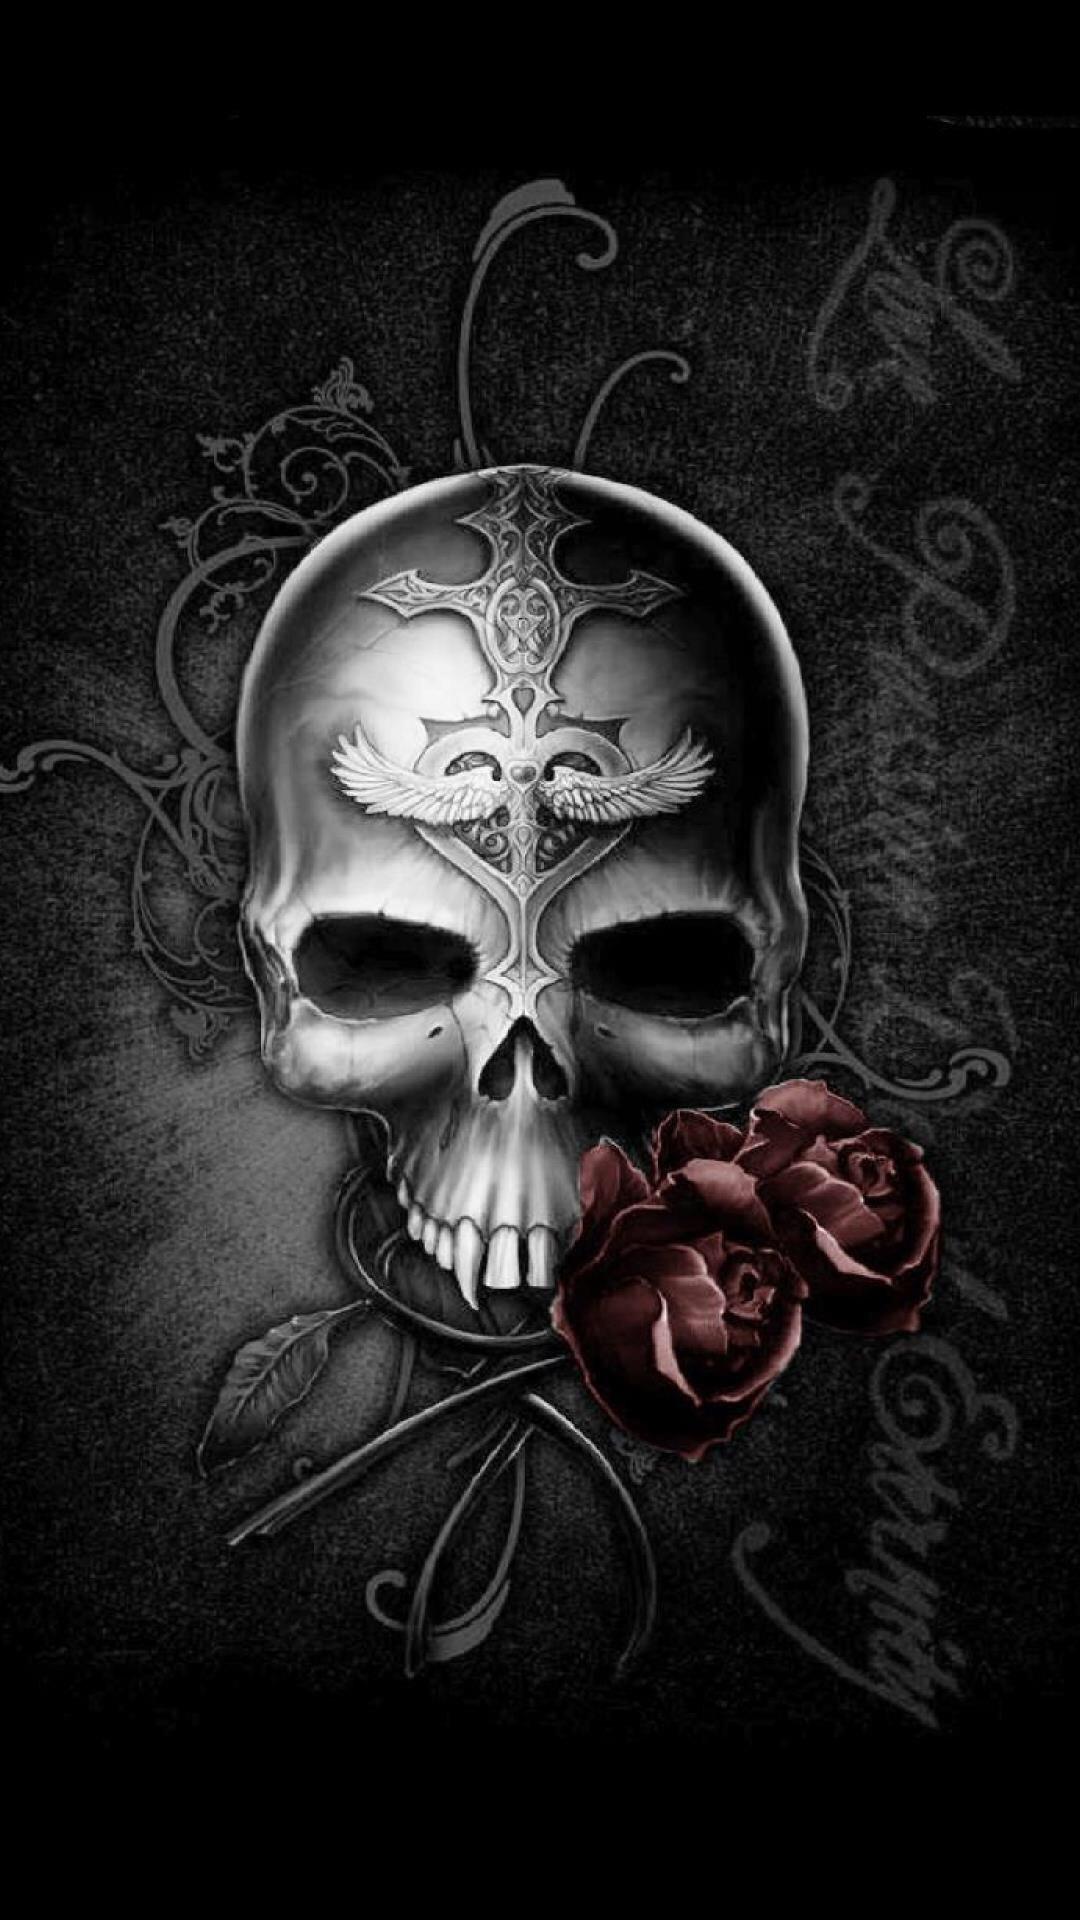 skull wallpaper for android ·①